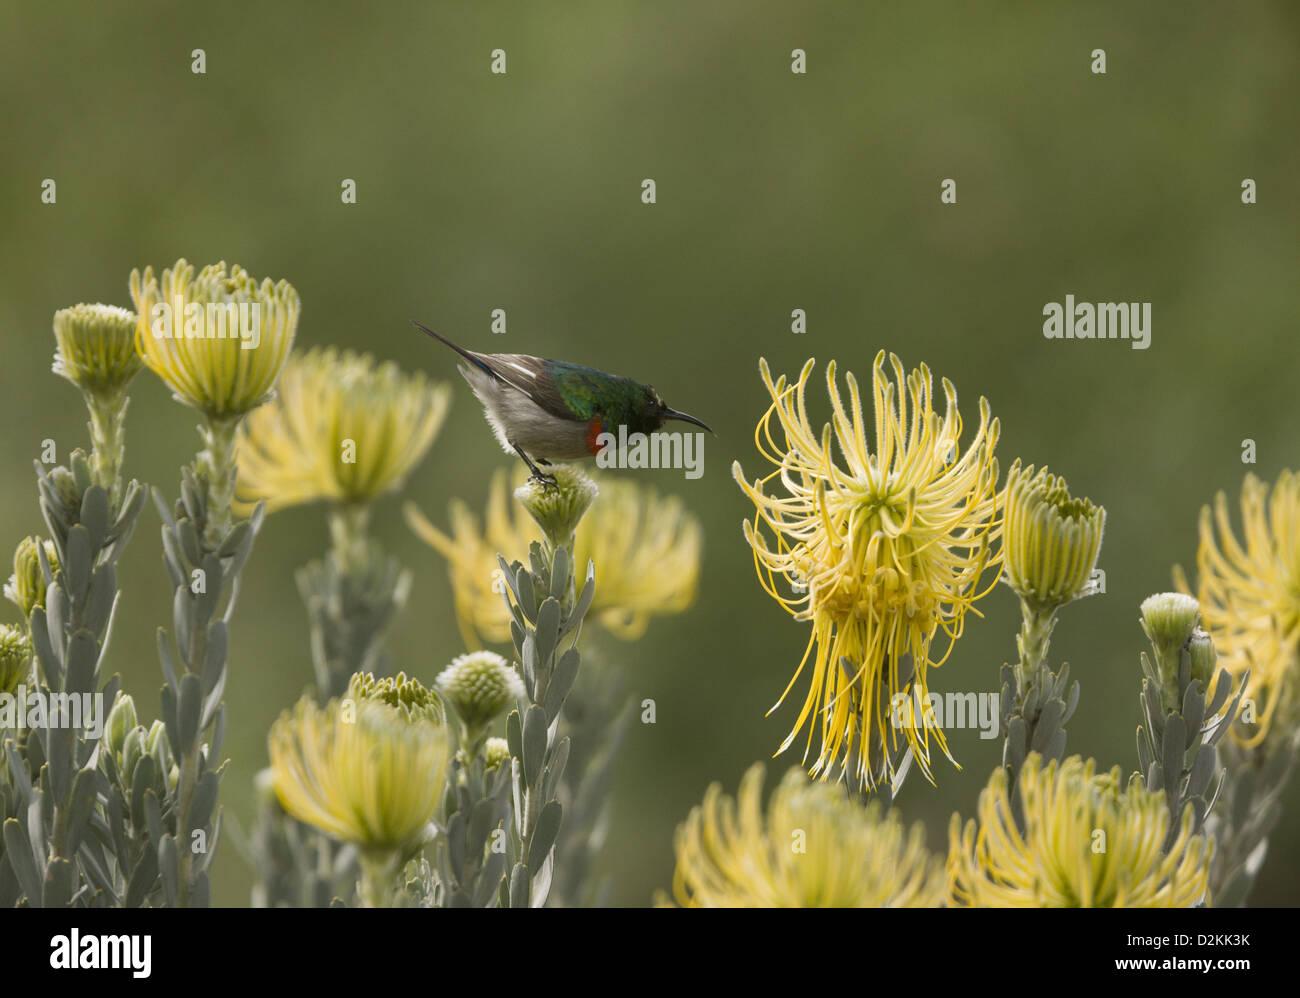 Lesser Double-collared Sunbird (Cinnyris chalybeus) on Yellow rocket pincushion (Leucospermum reflexum var. luteum) - Stock Image